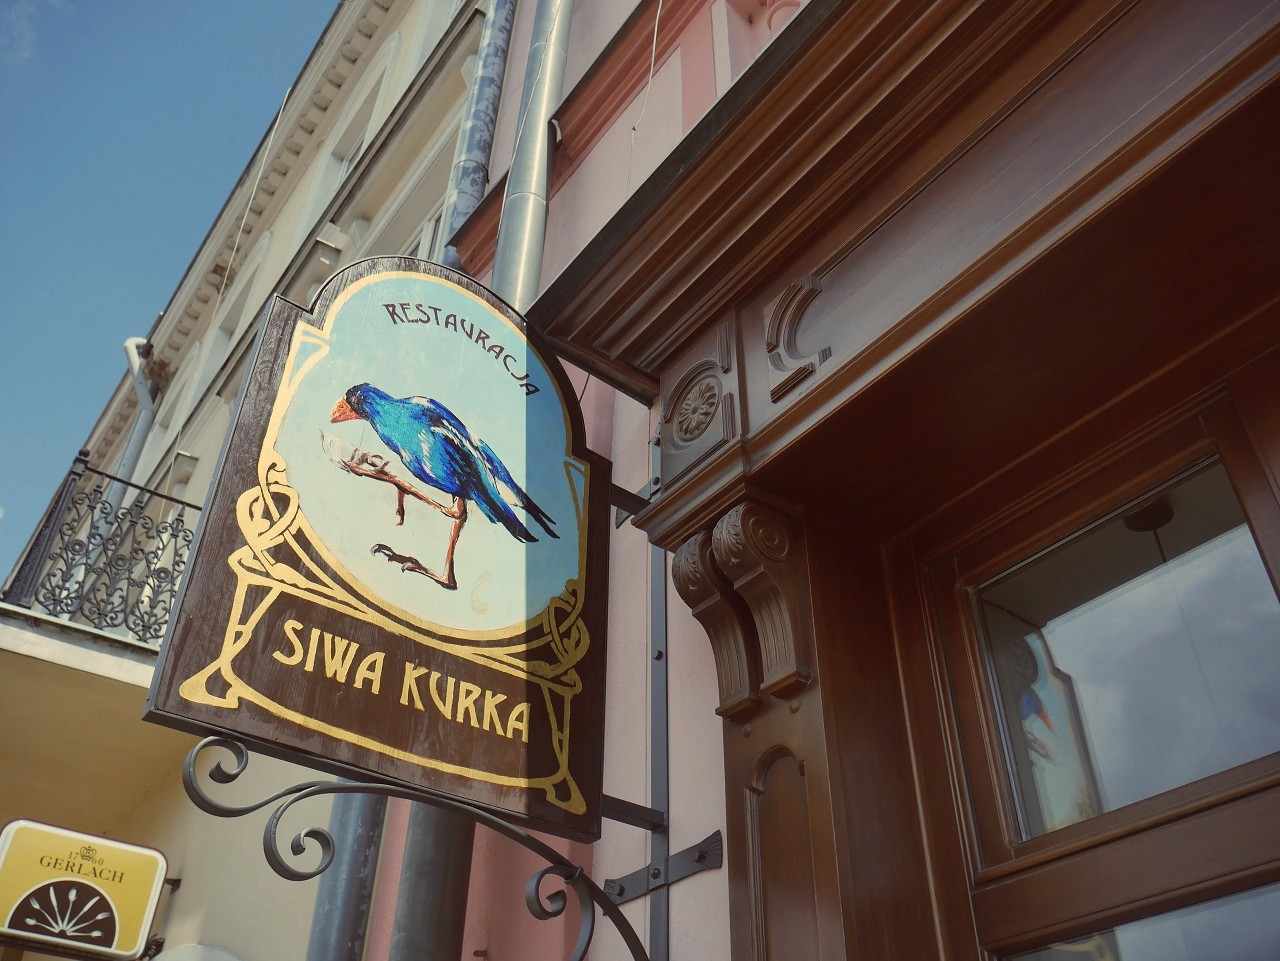 Siwa Kurka w Jarosławiu